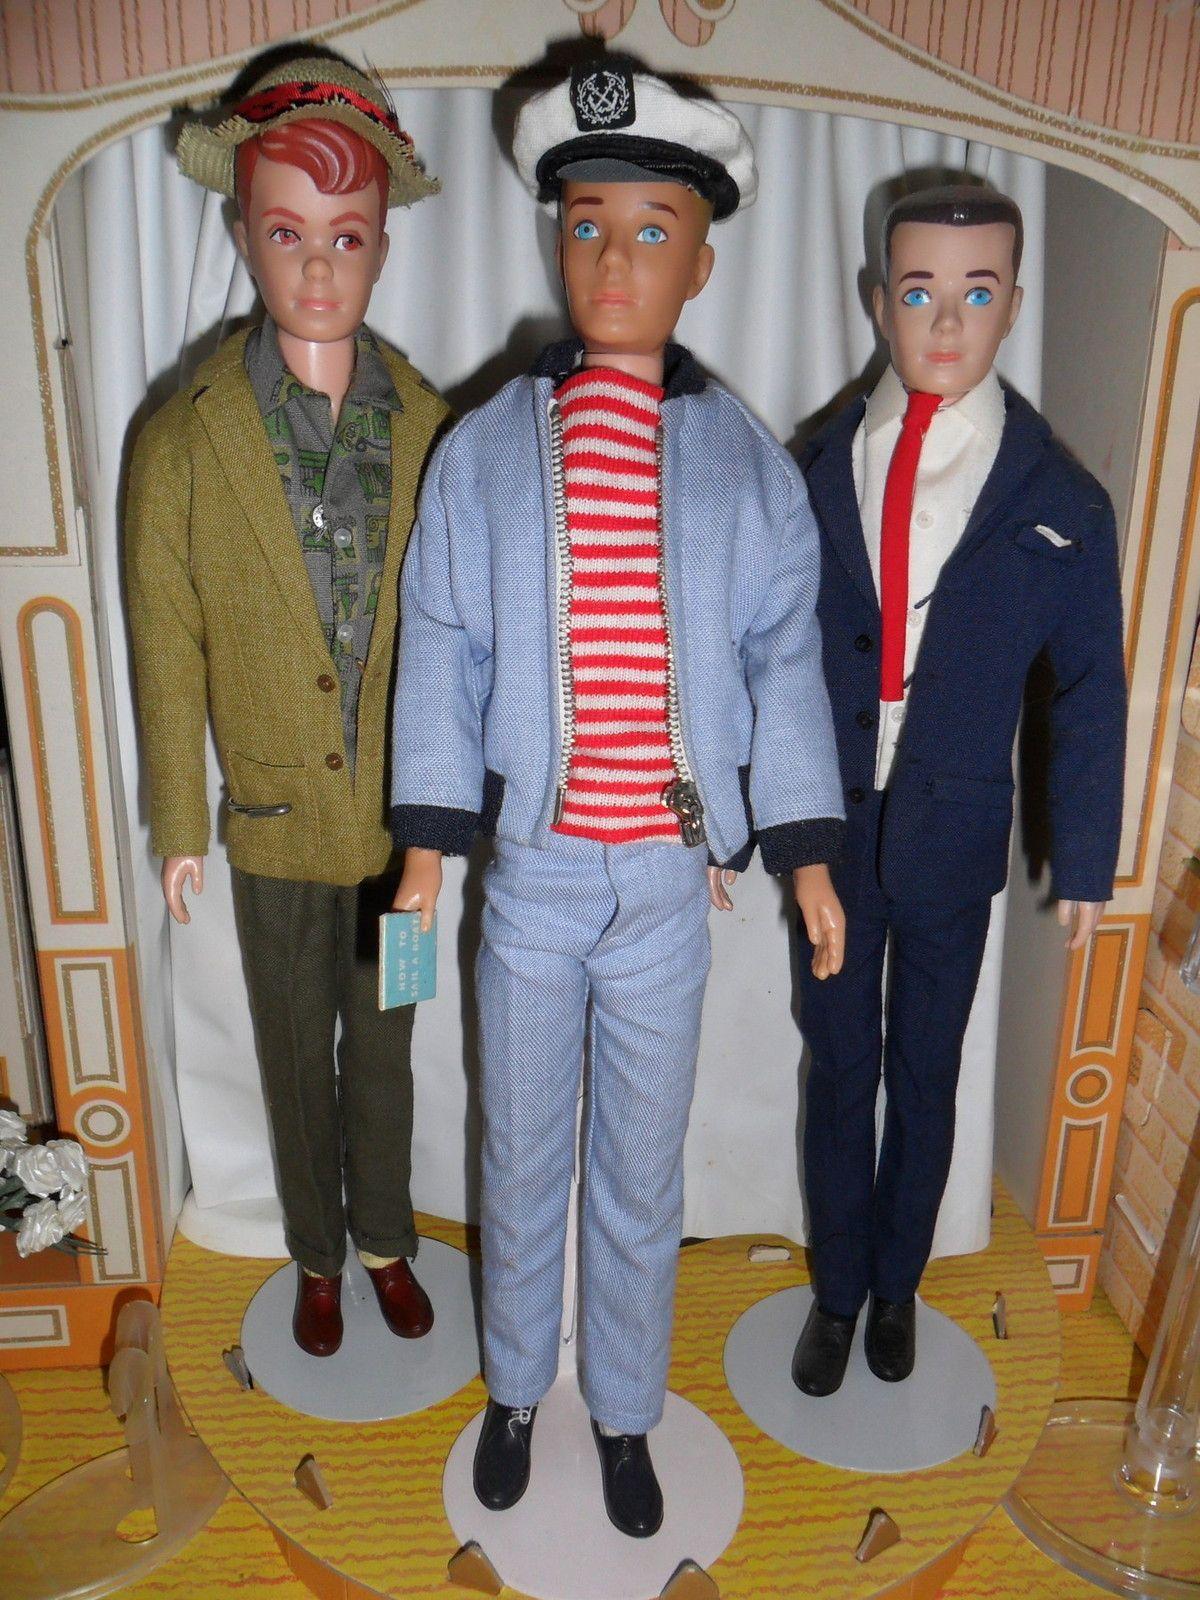 Allan With Kens In Yachtsman Special Date Outfits 1960 S Barbie Wardrobe Ken Barbie Doll Vintage Barbie Dolls